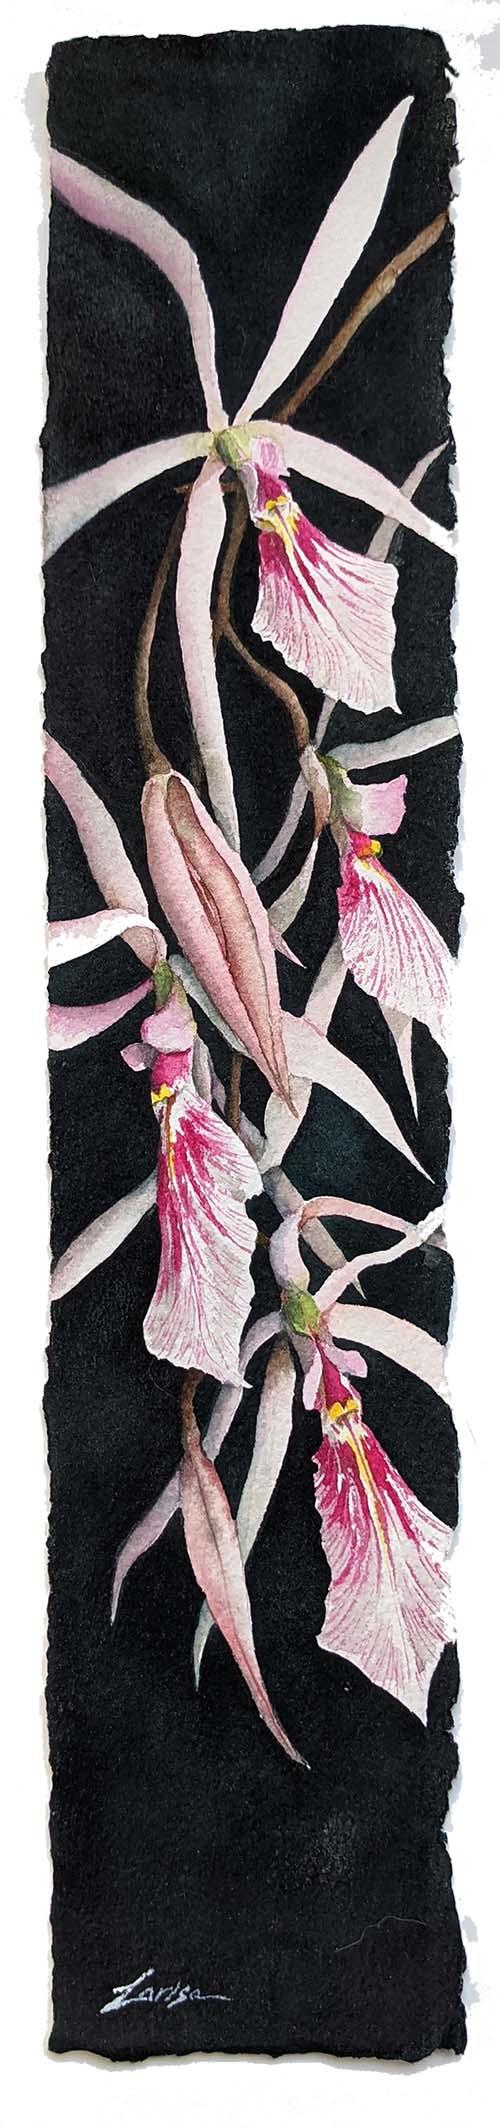 Venezuelan Orchids - Larisa Cheladyn